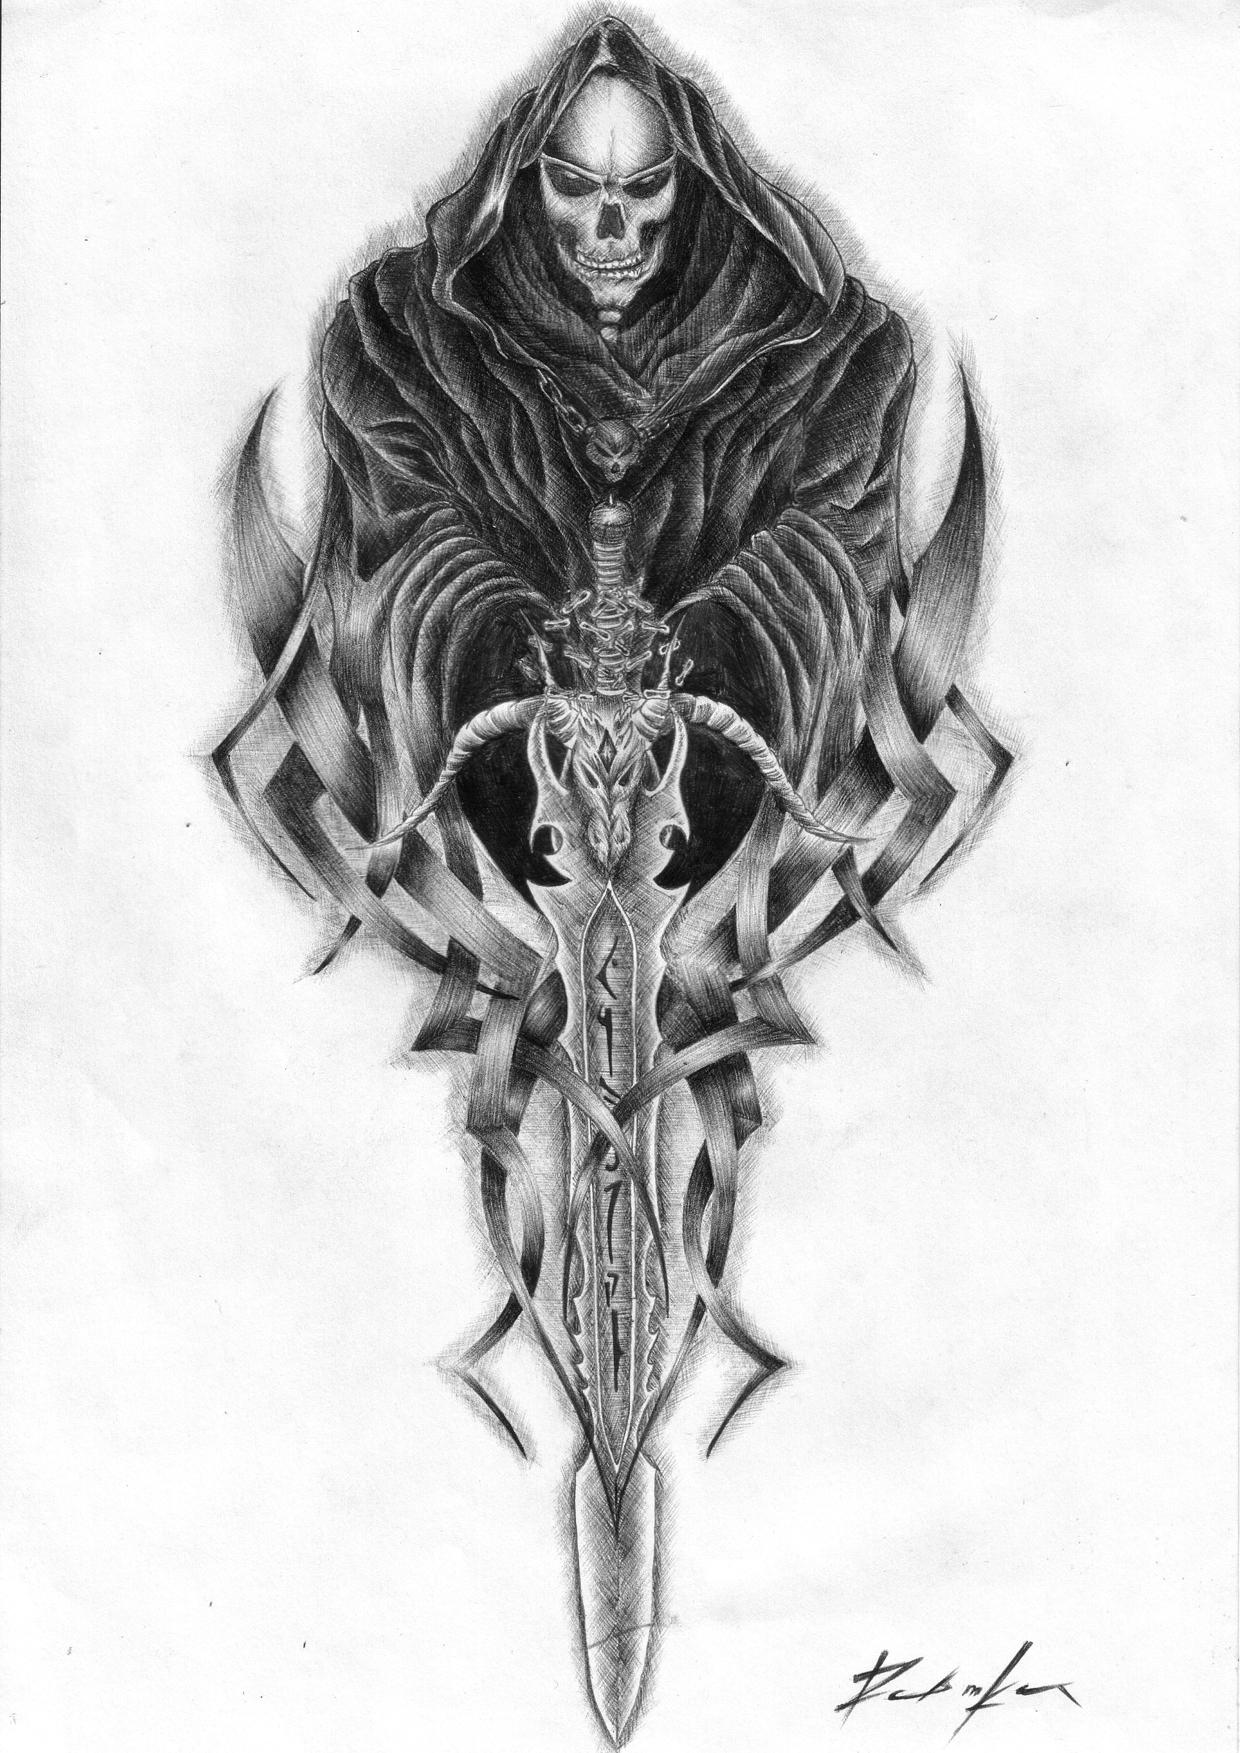 Grim Reaper Tattoo Design Picture In Album Traditional Art Pxleyes